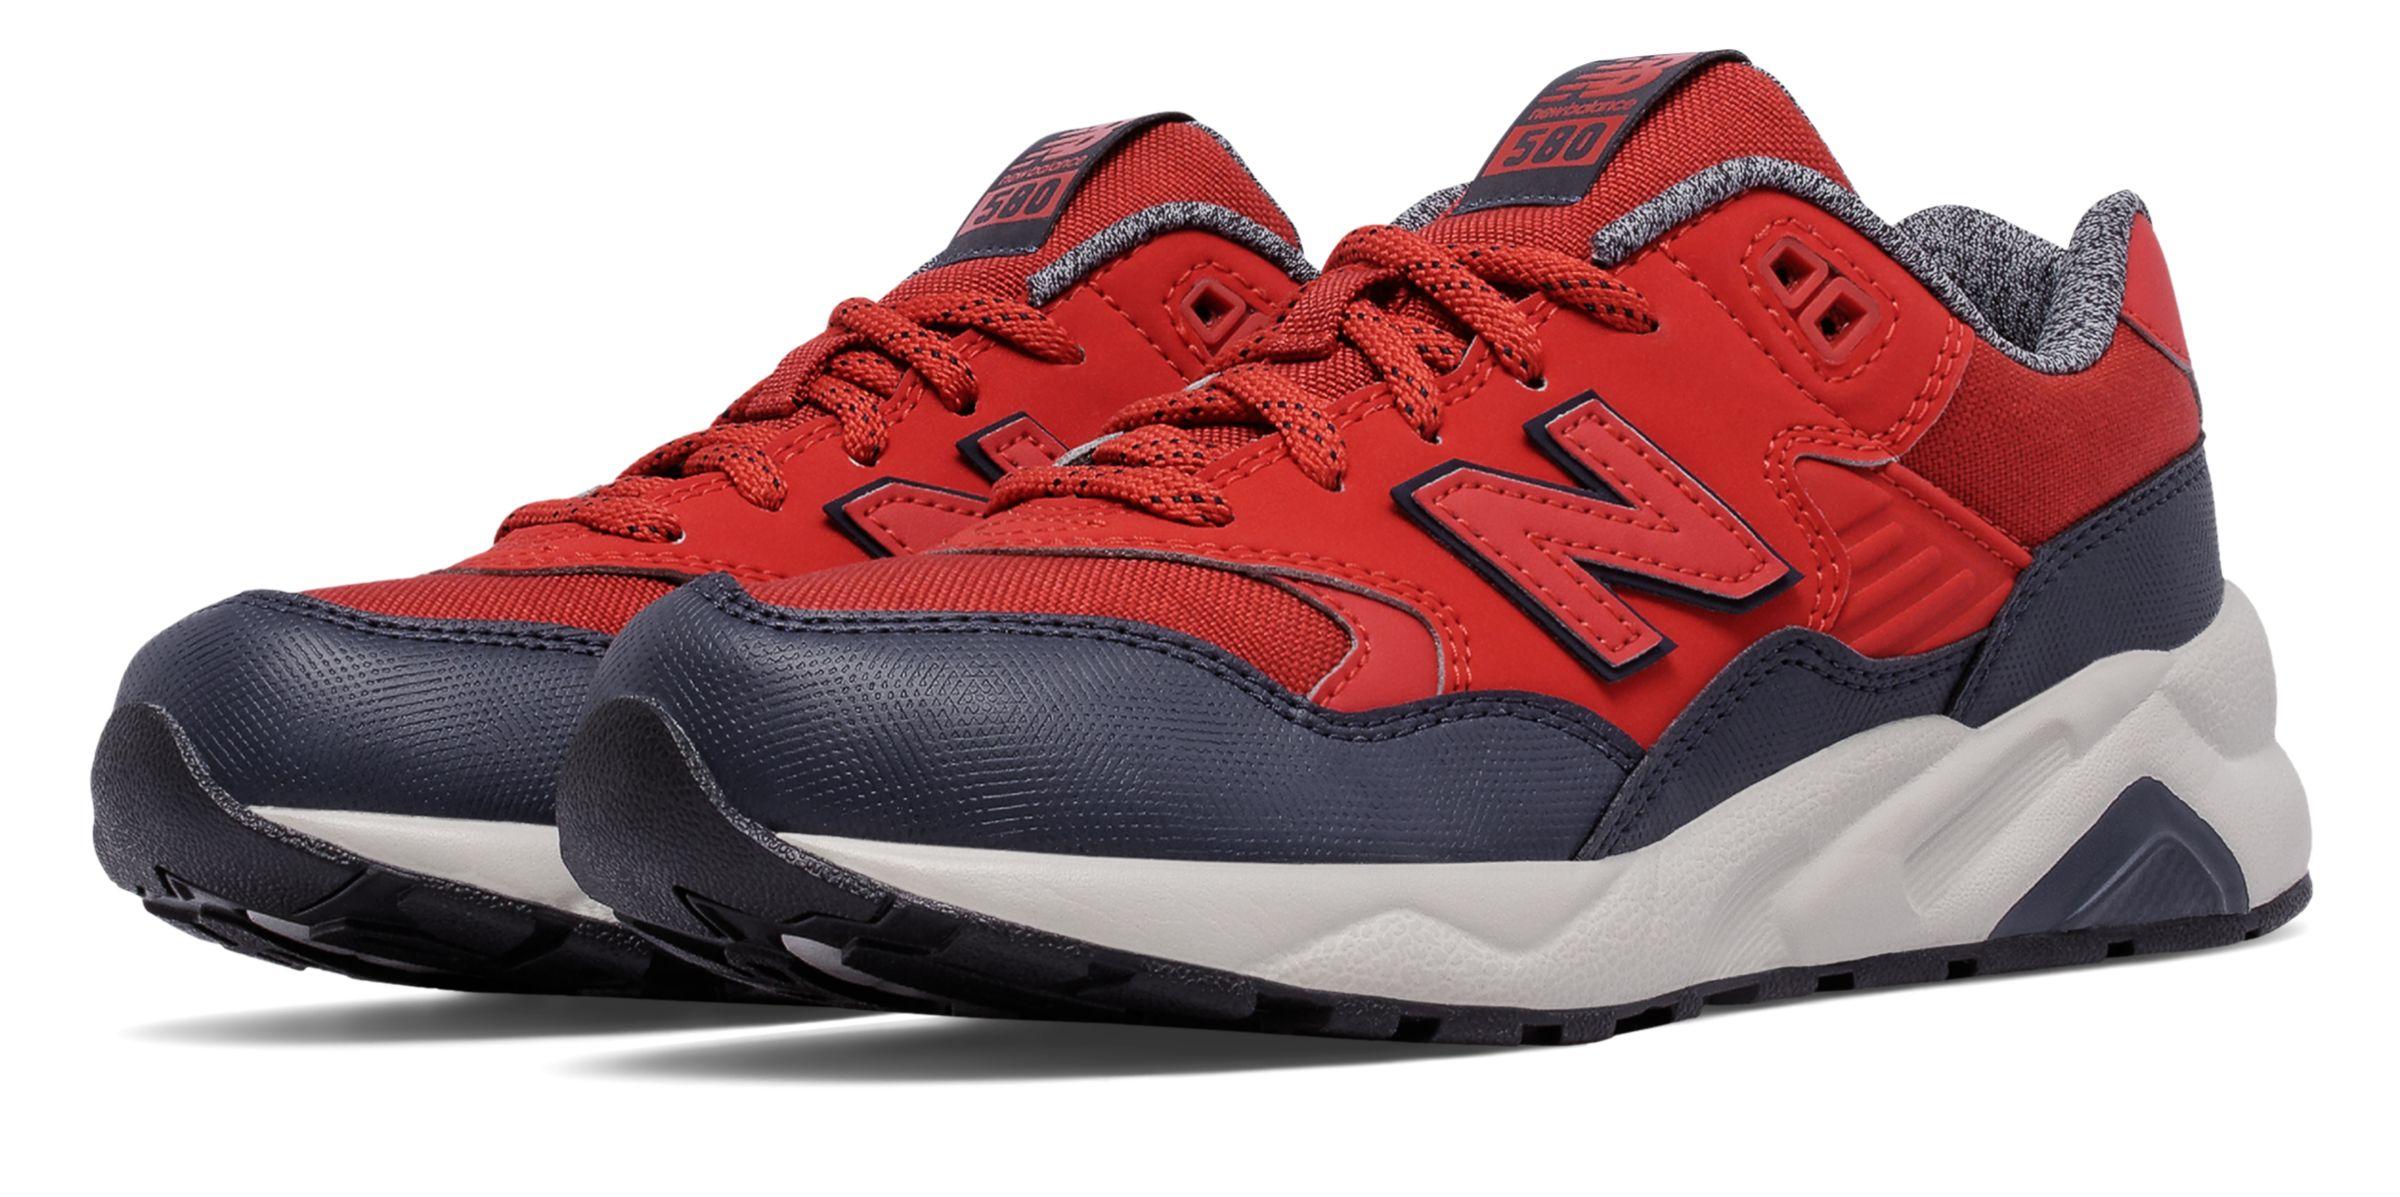 New Balance 580 Grade - school Boys Shoes Red